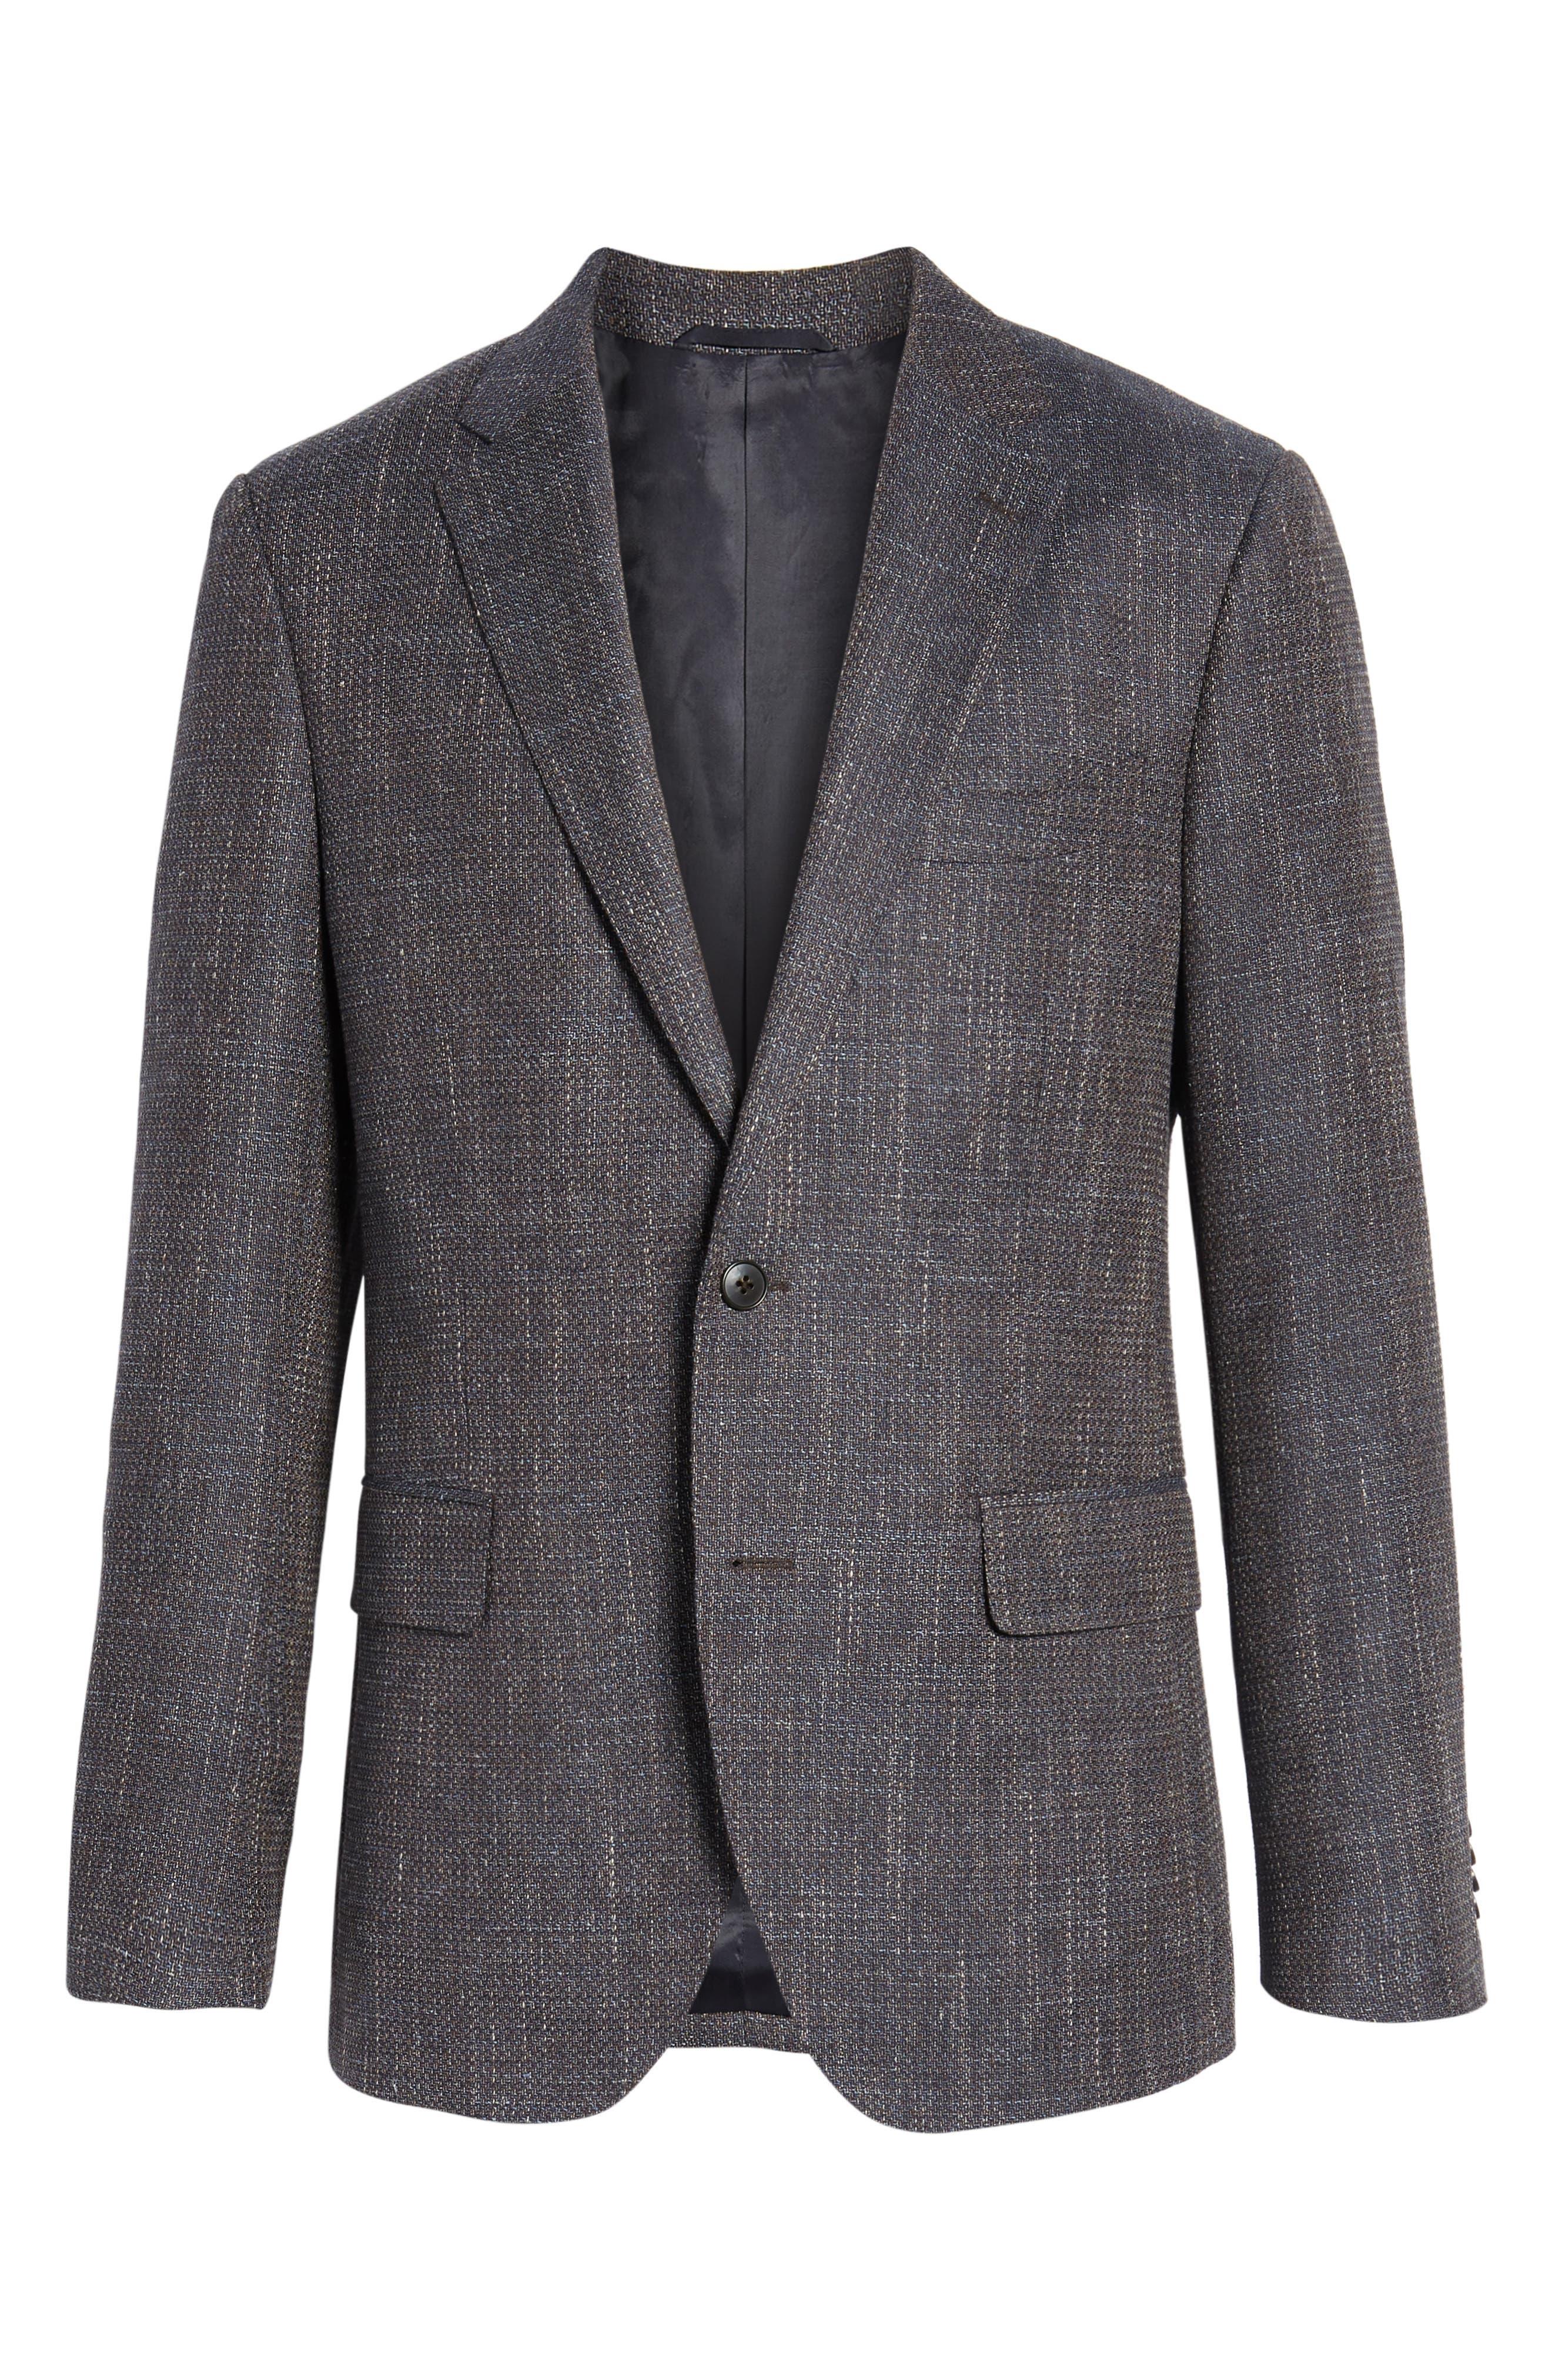 Five Bridges Slim Fit Tweed Sport Coat,                             Alternate thumbnail 5, color,                             800